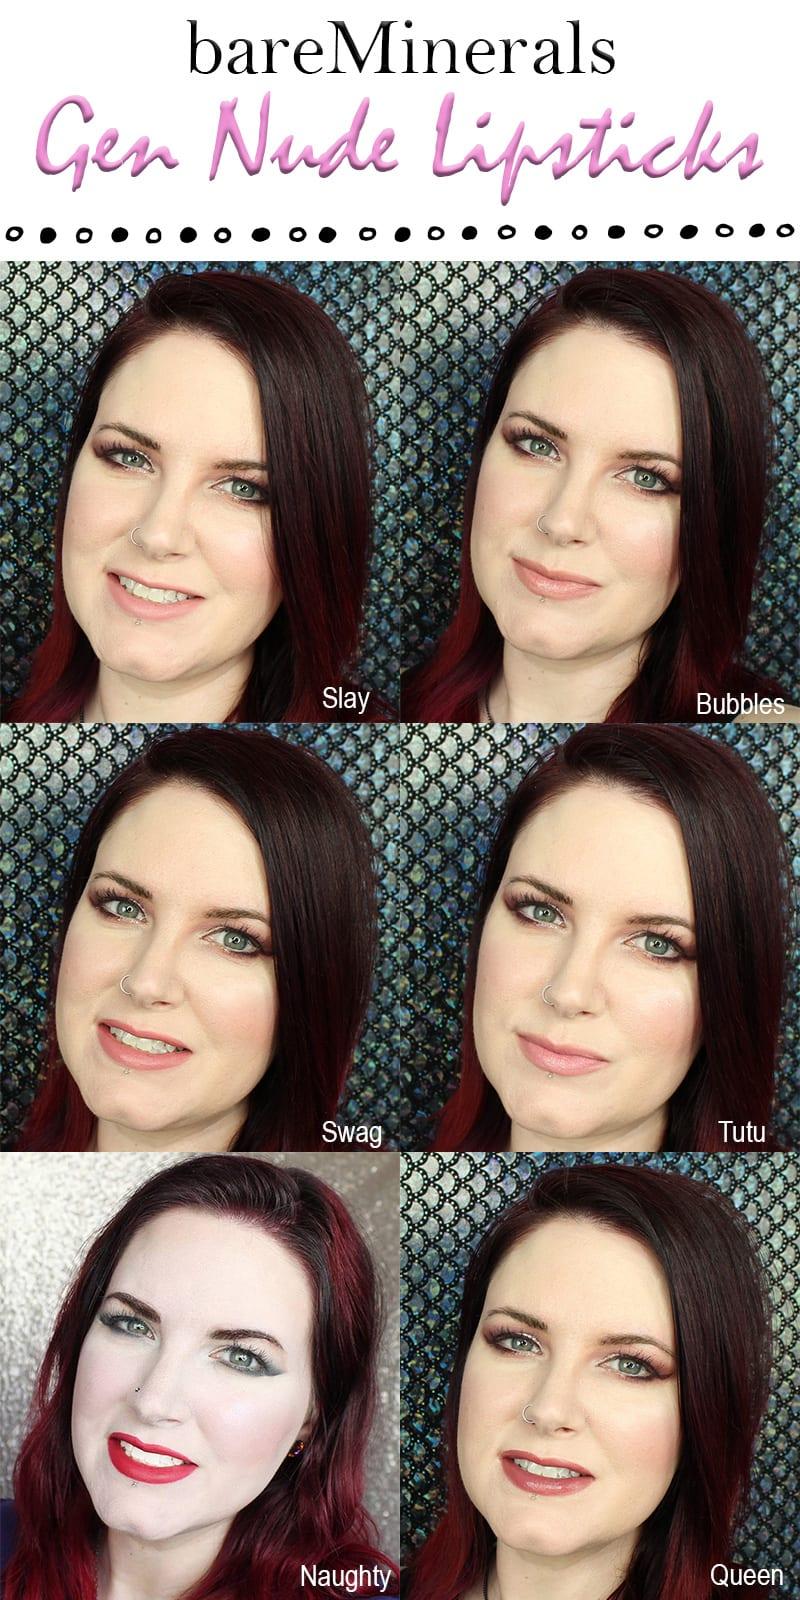 bareMinerals Gen Nude Lipsticks Review Swatches Looks